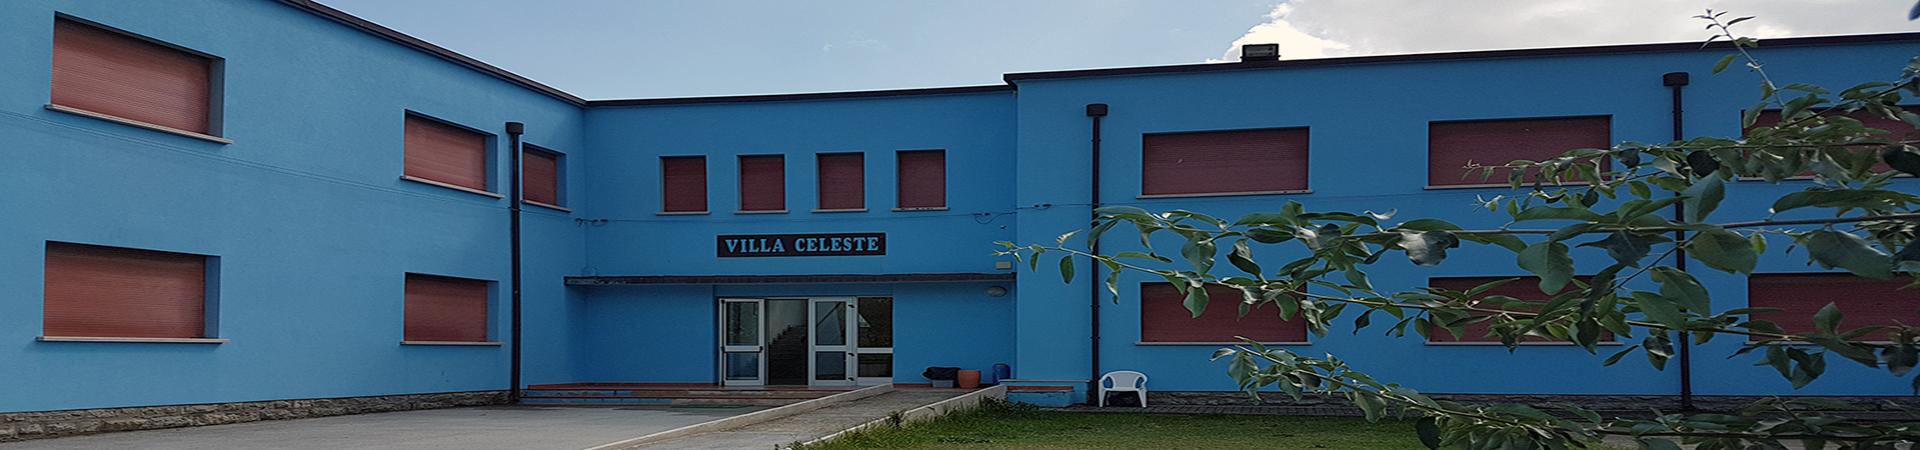 Villa Celeste Copertina 1